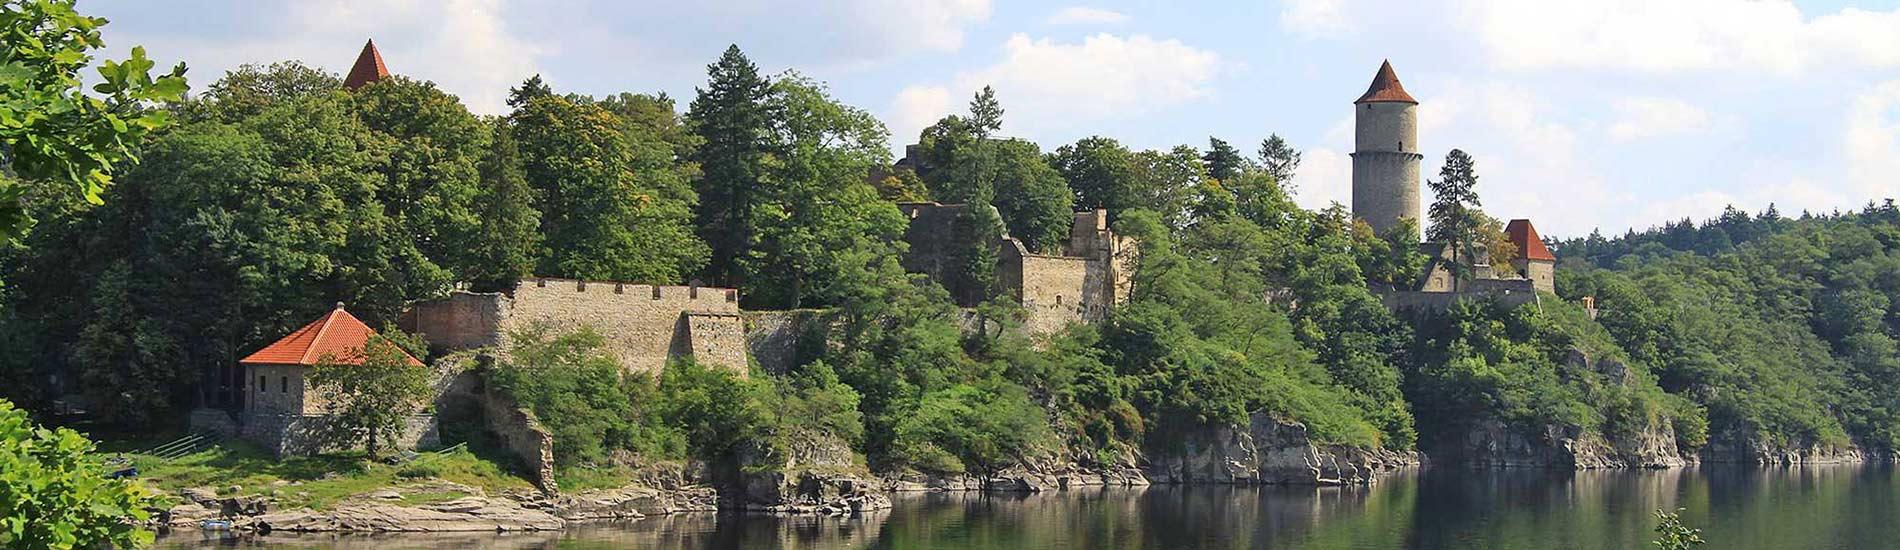 Hrad Zvíkov - Burg Klingenberg